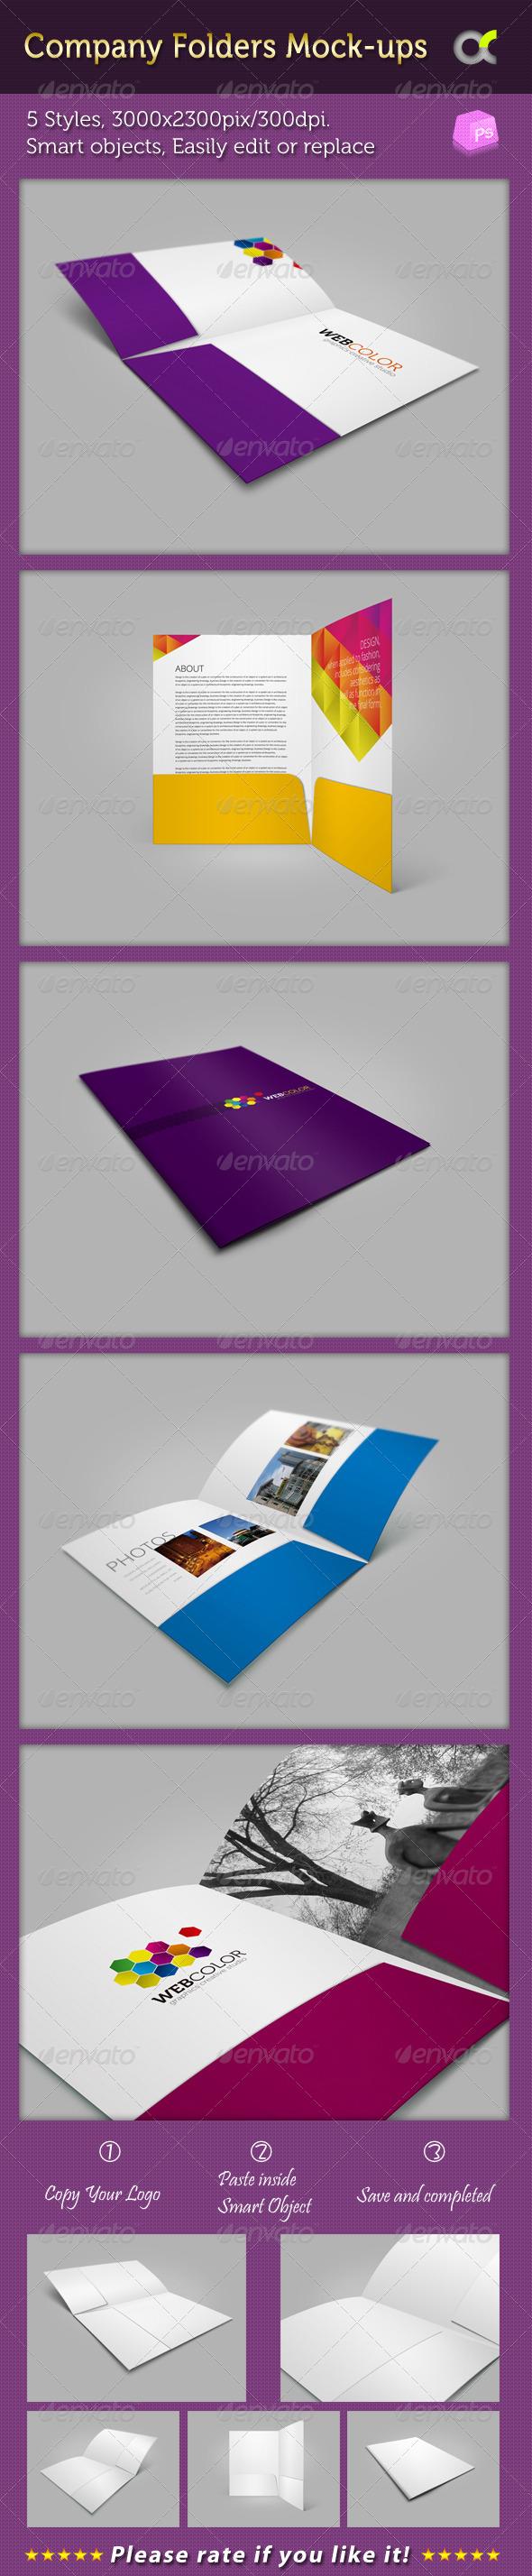 Company Folders Mock-ups - Product Mock-Ups Graphics